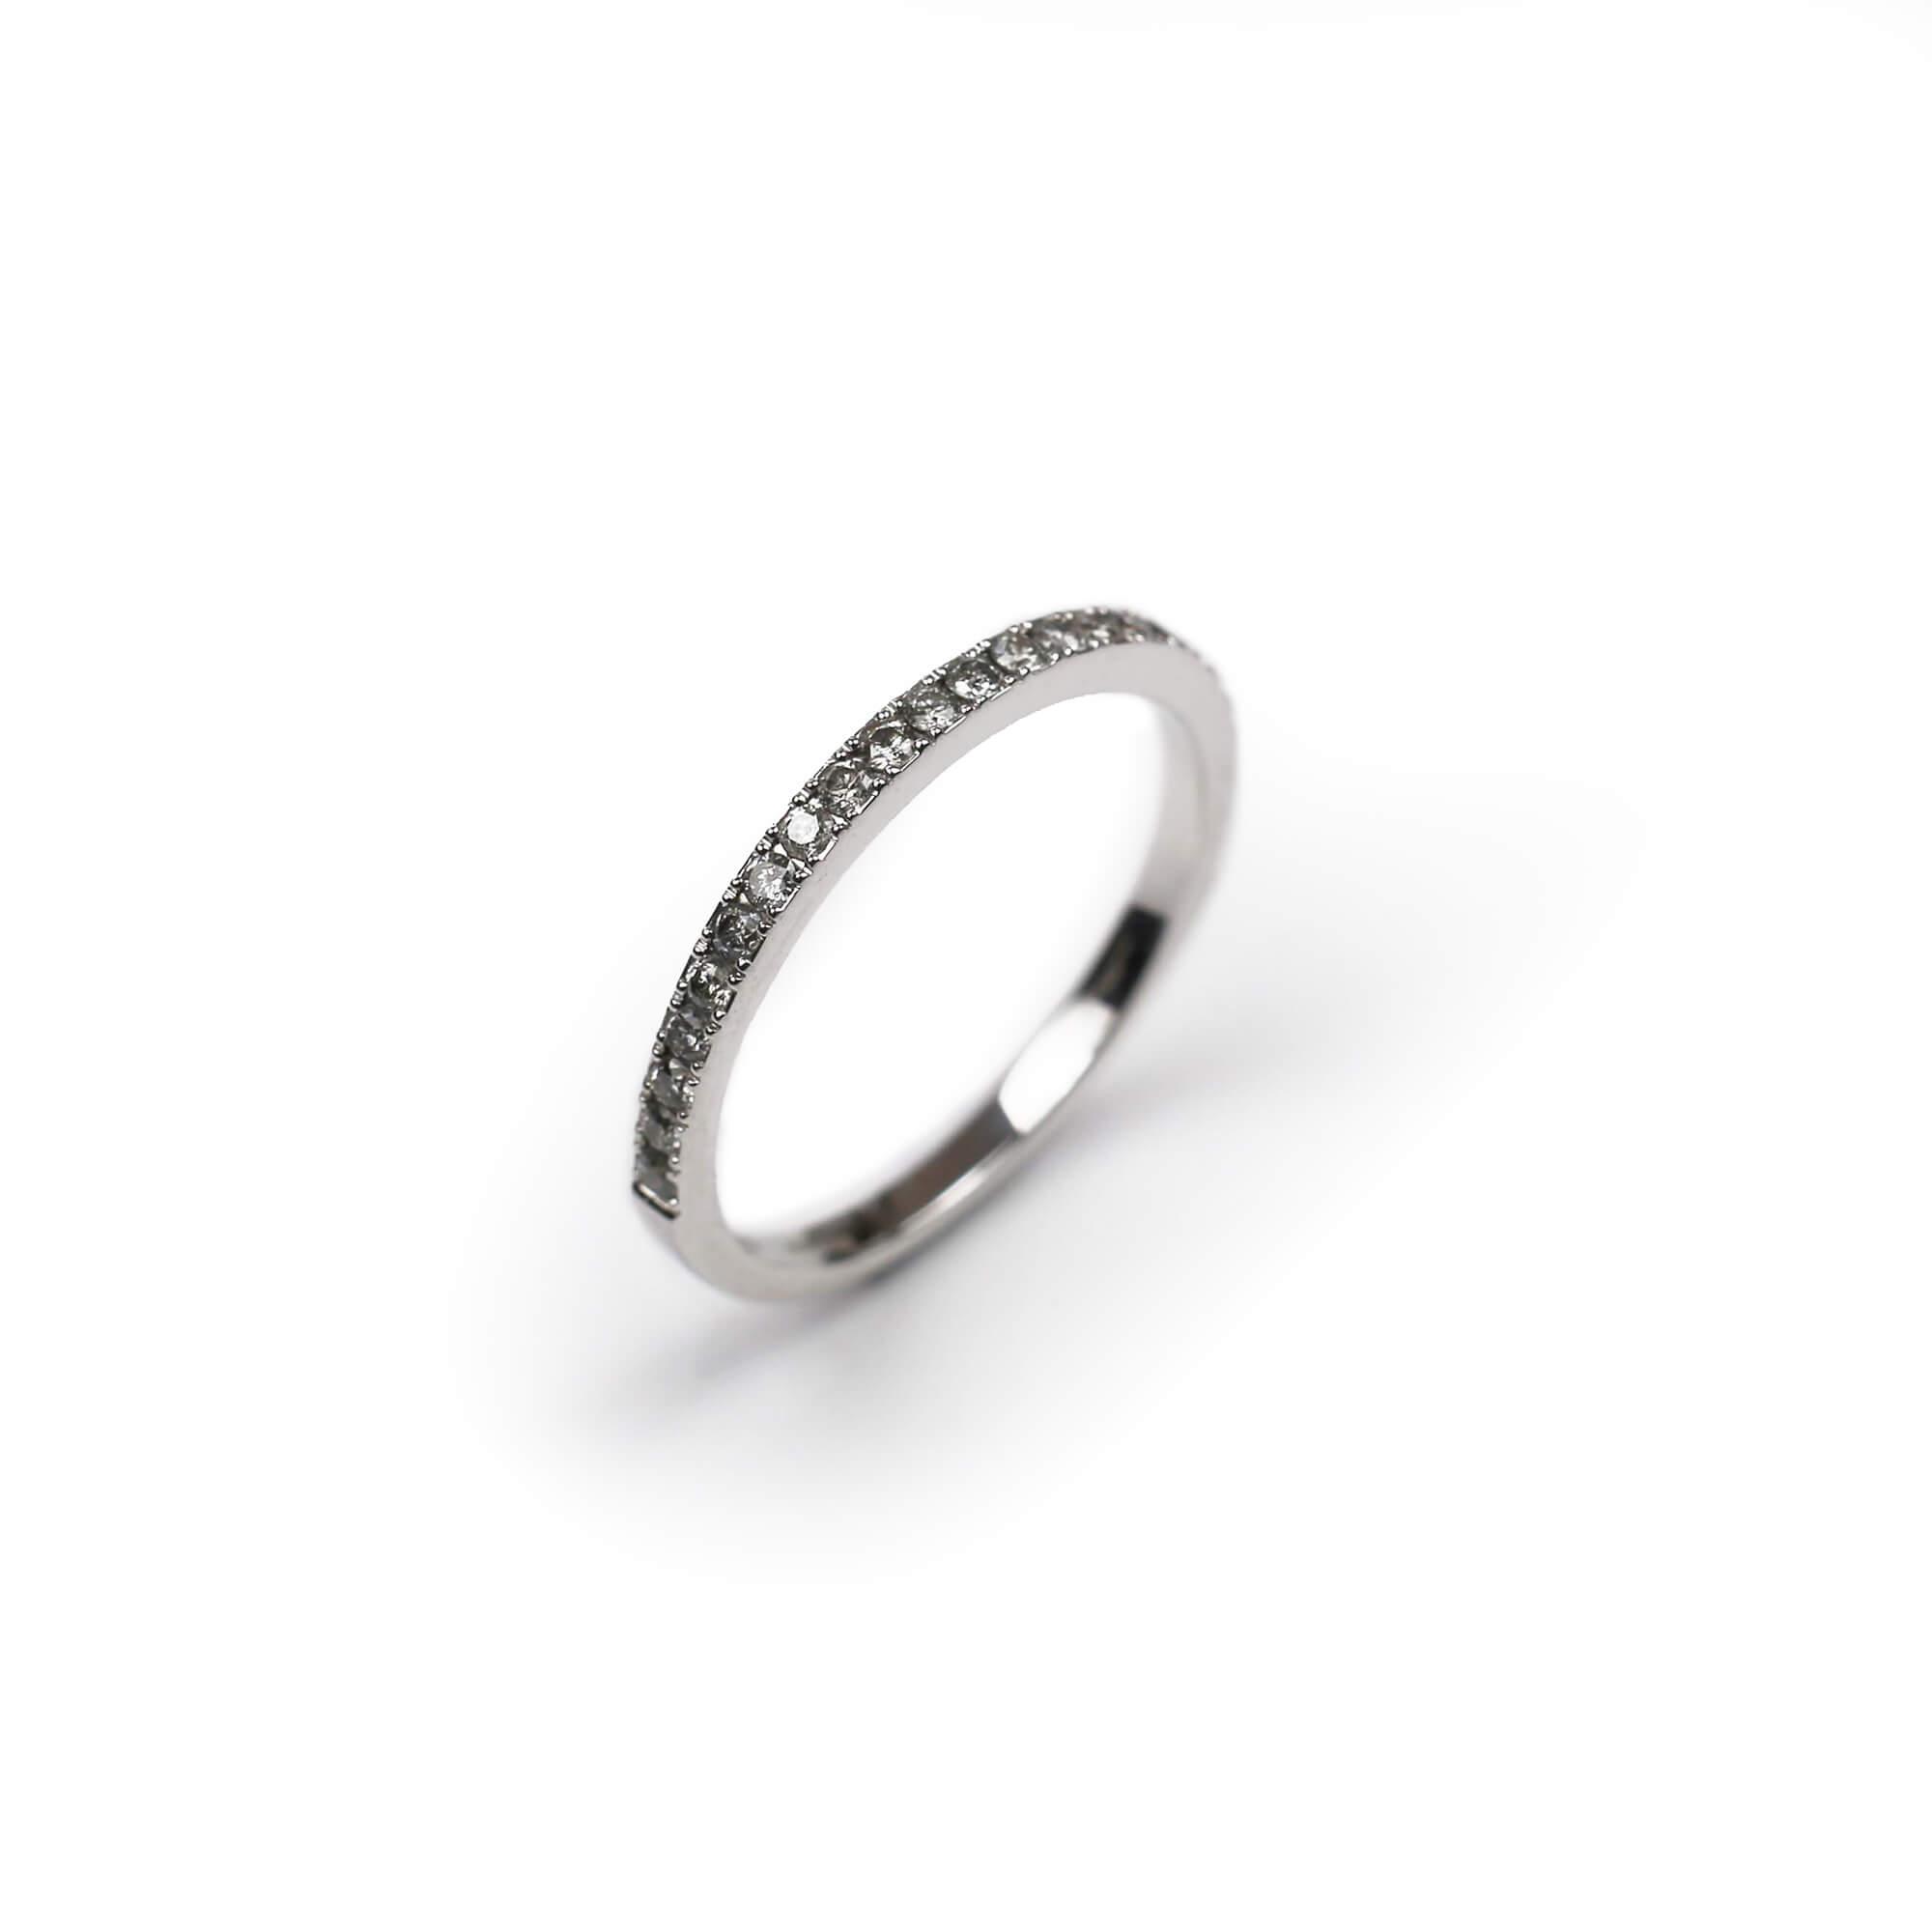 Grey diamond and white gold band